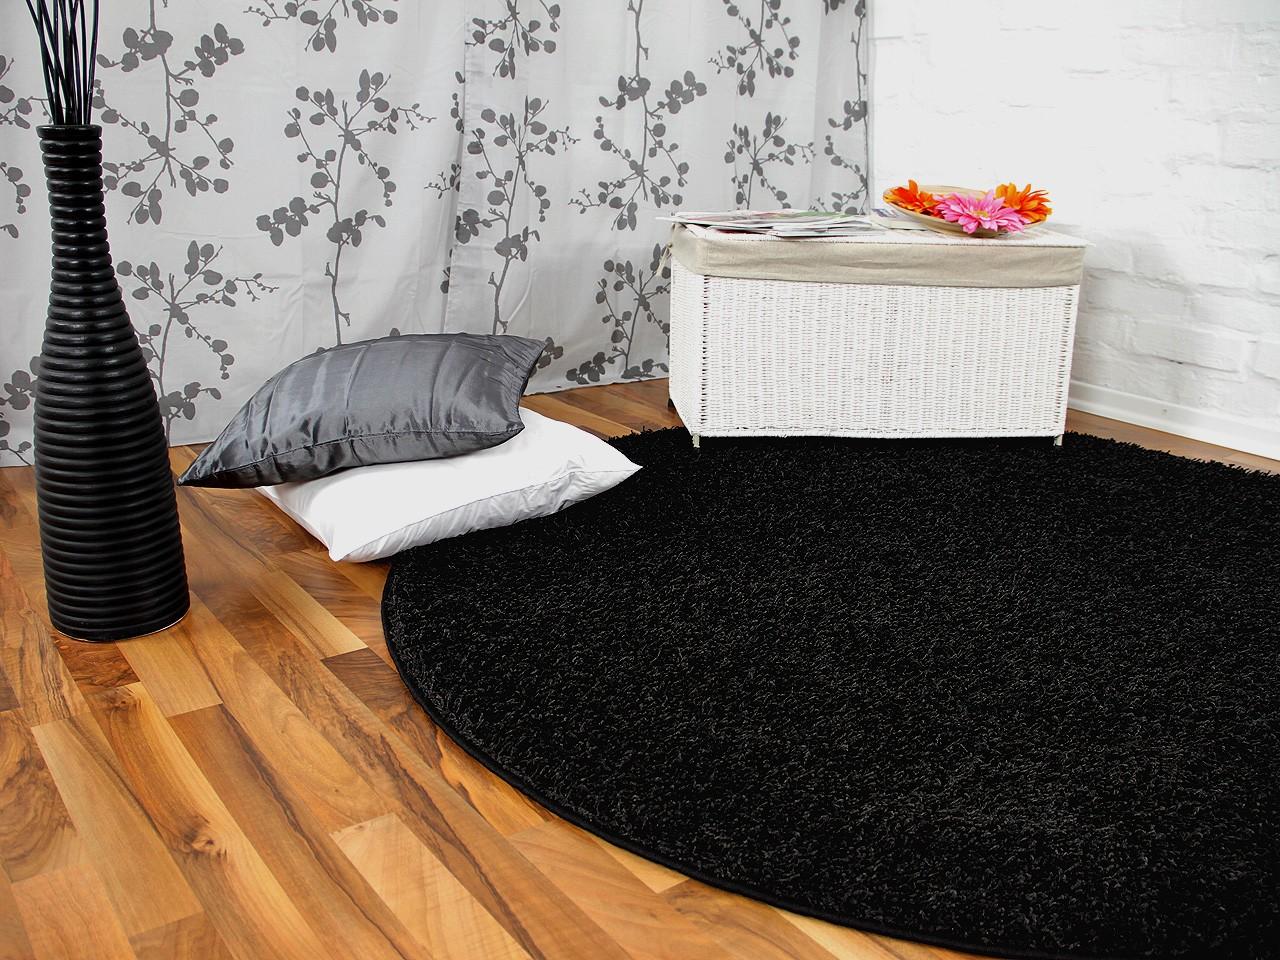 hochflor langflor teppich shaggy nova schwarz rund sonderaktion teppiche hochflor langflor. Black Bedroom Furniture Sets. Home Design Ideas